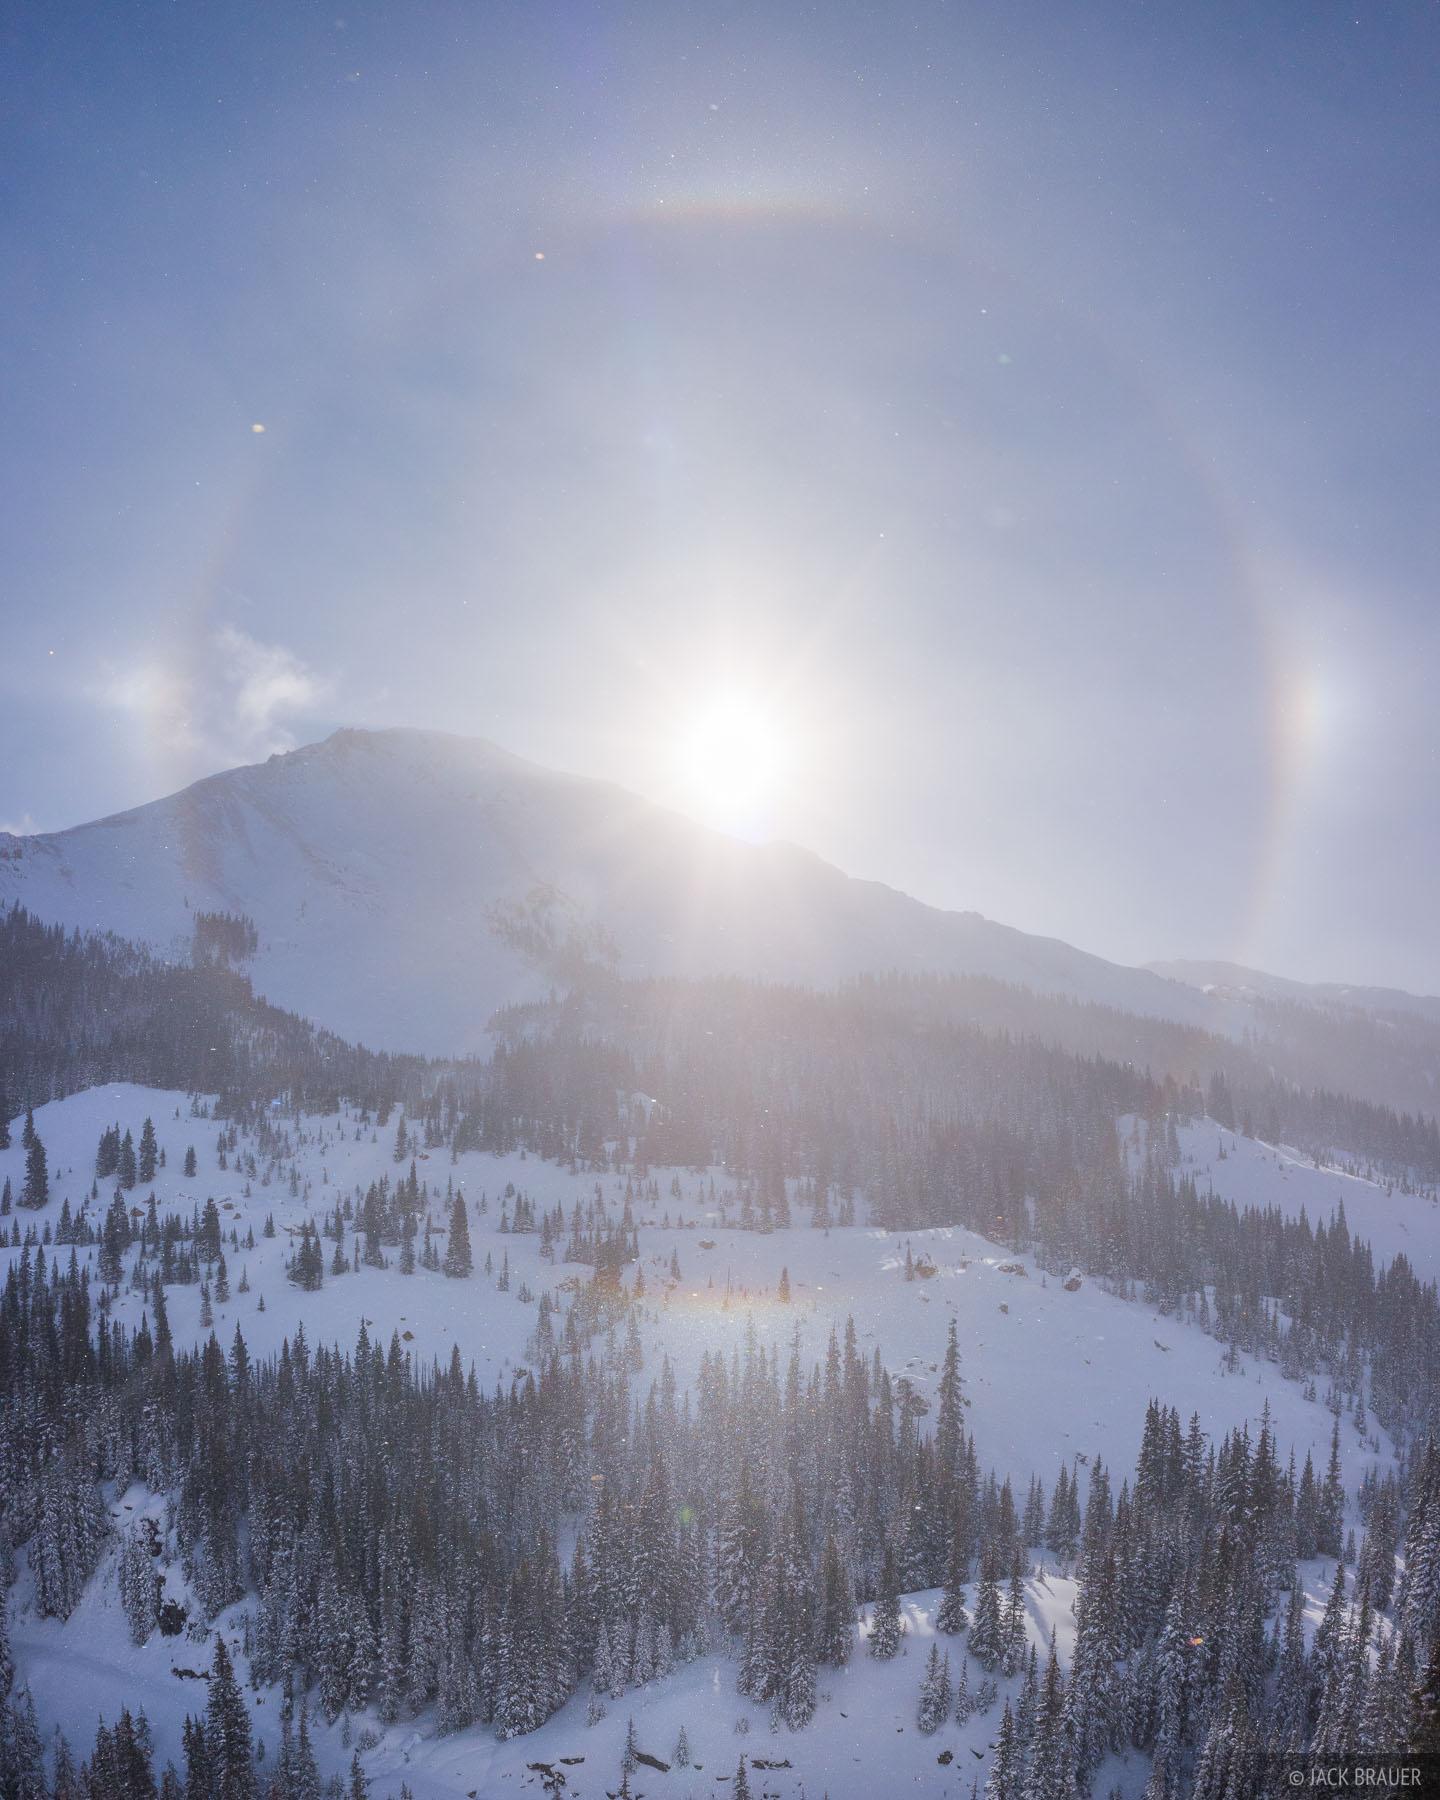 A sundog over Red Mountain #3, December.